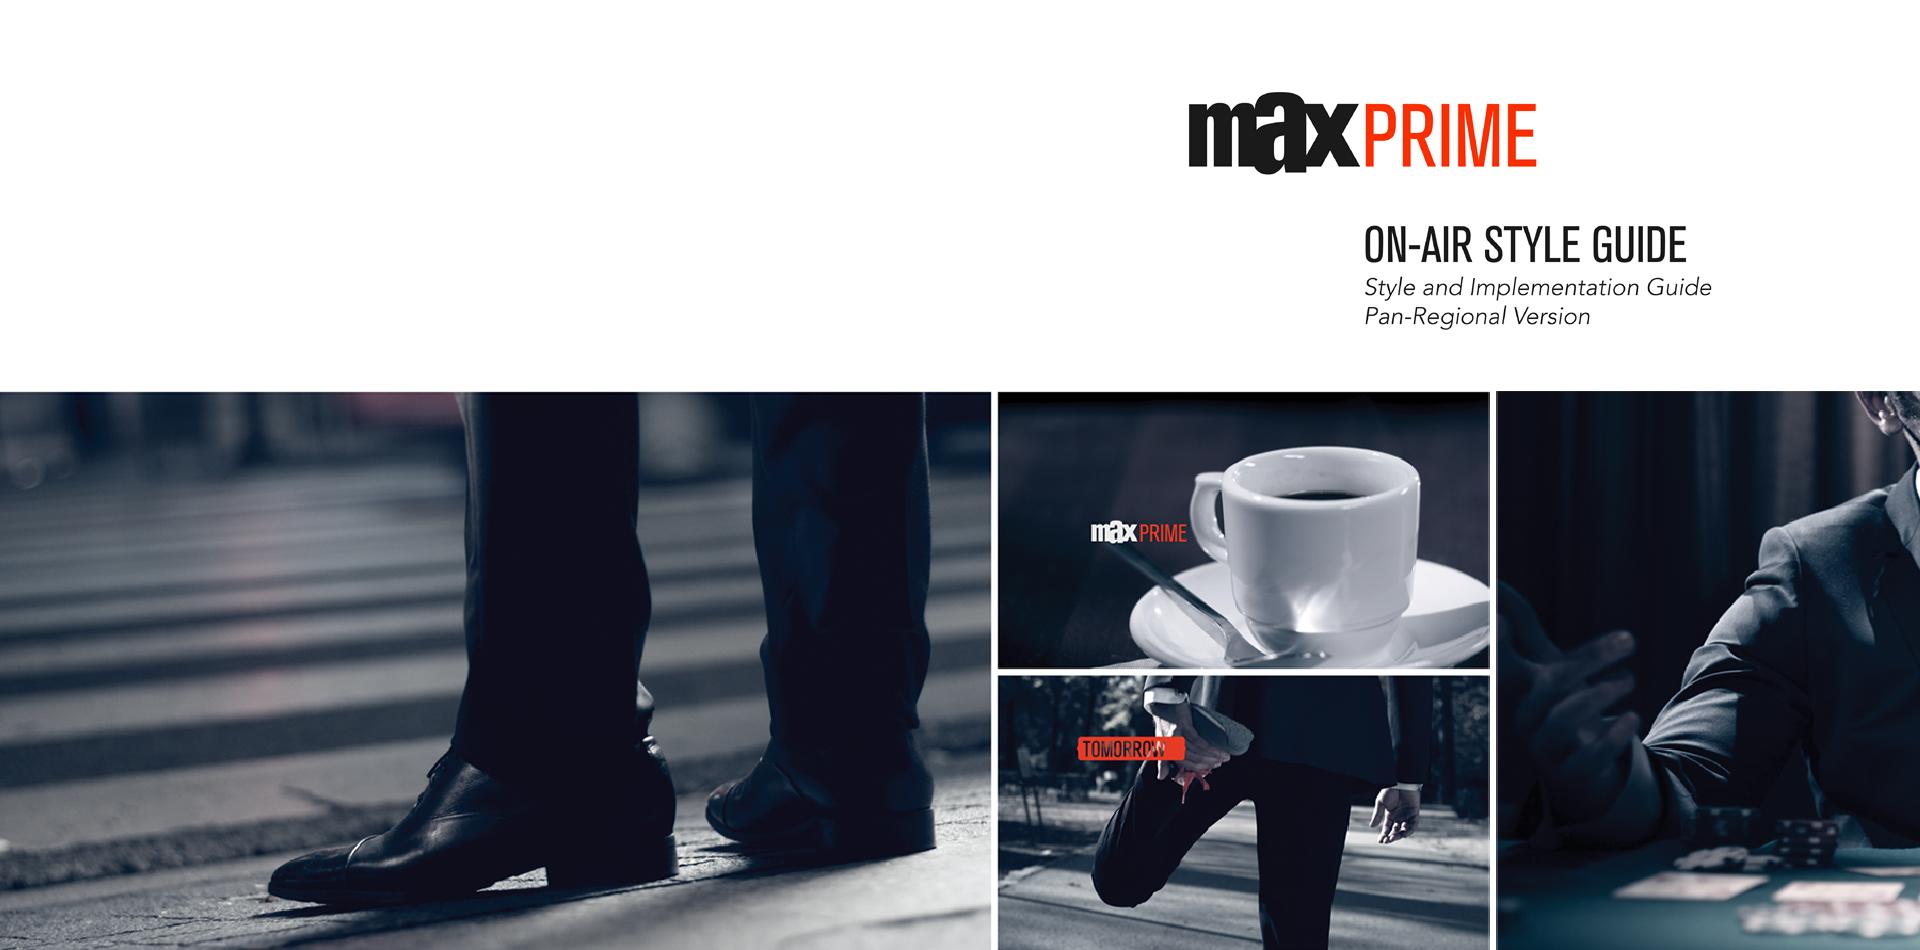 MAXPRIME_Rebrand_StyleGuideWeb_v2_01.jpg